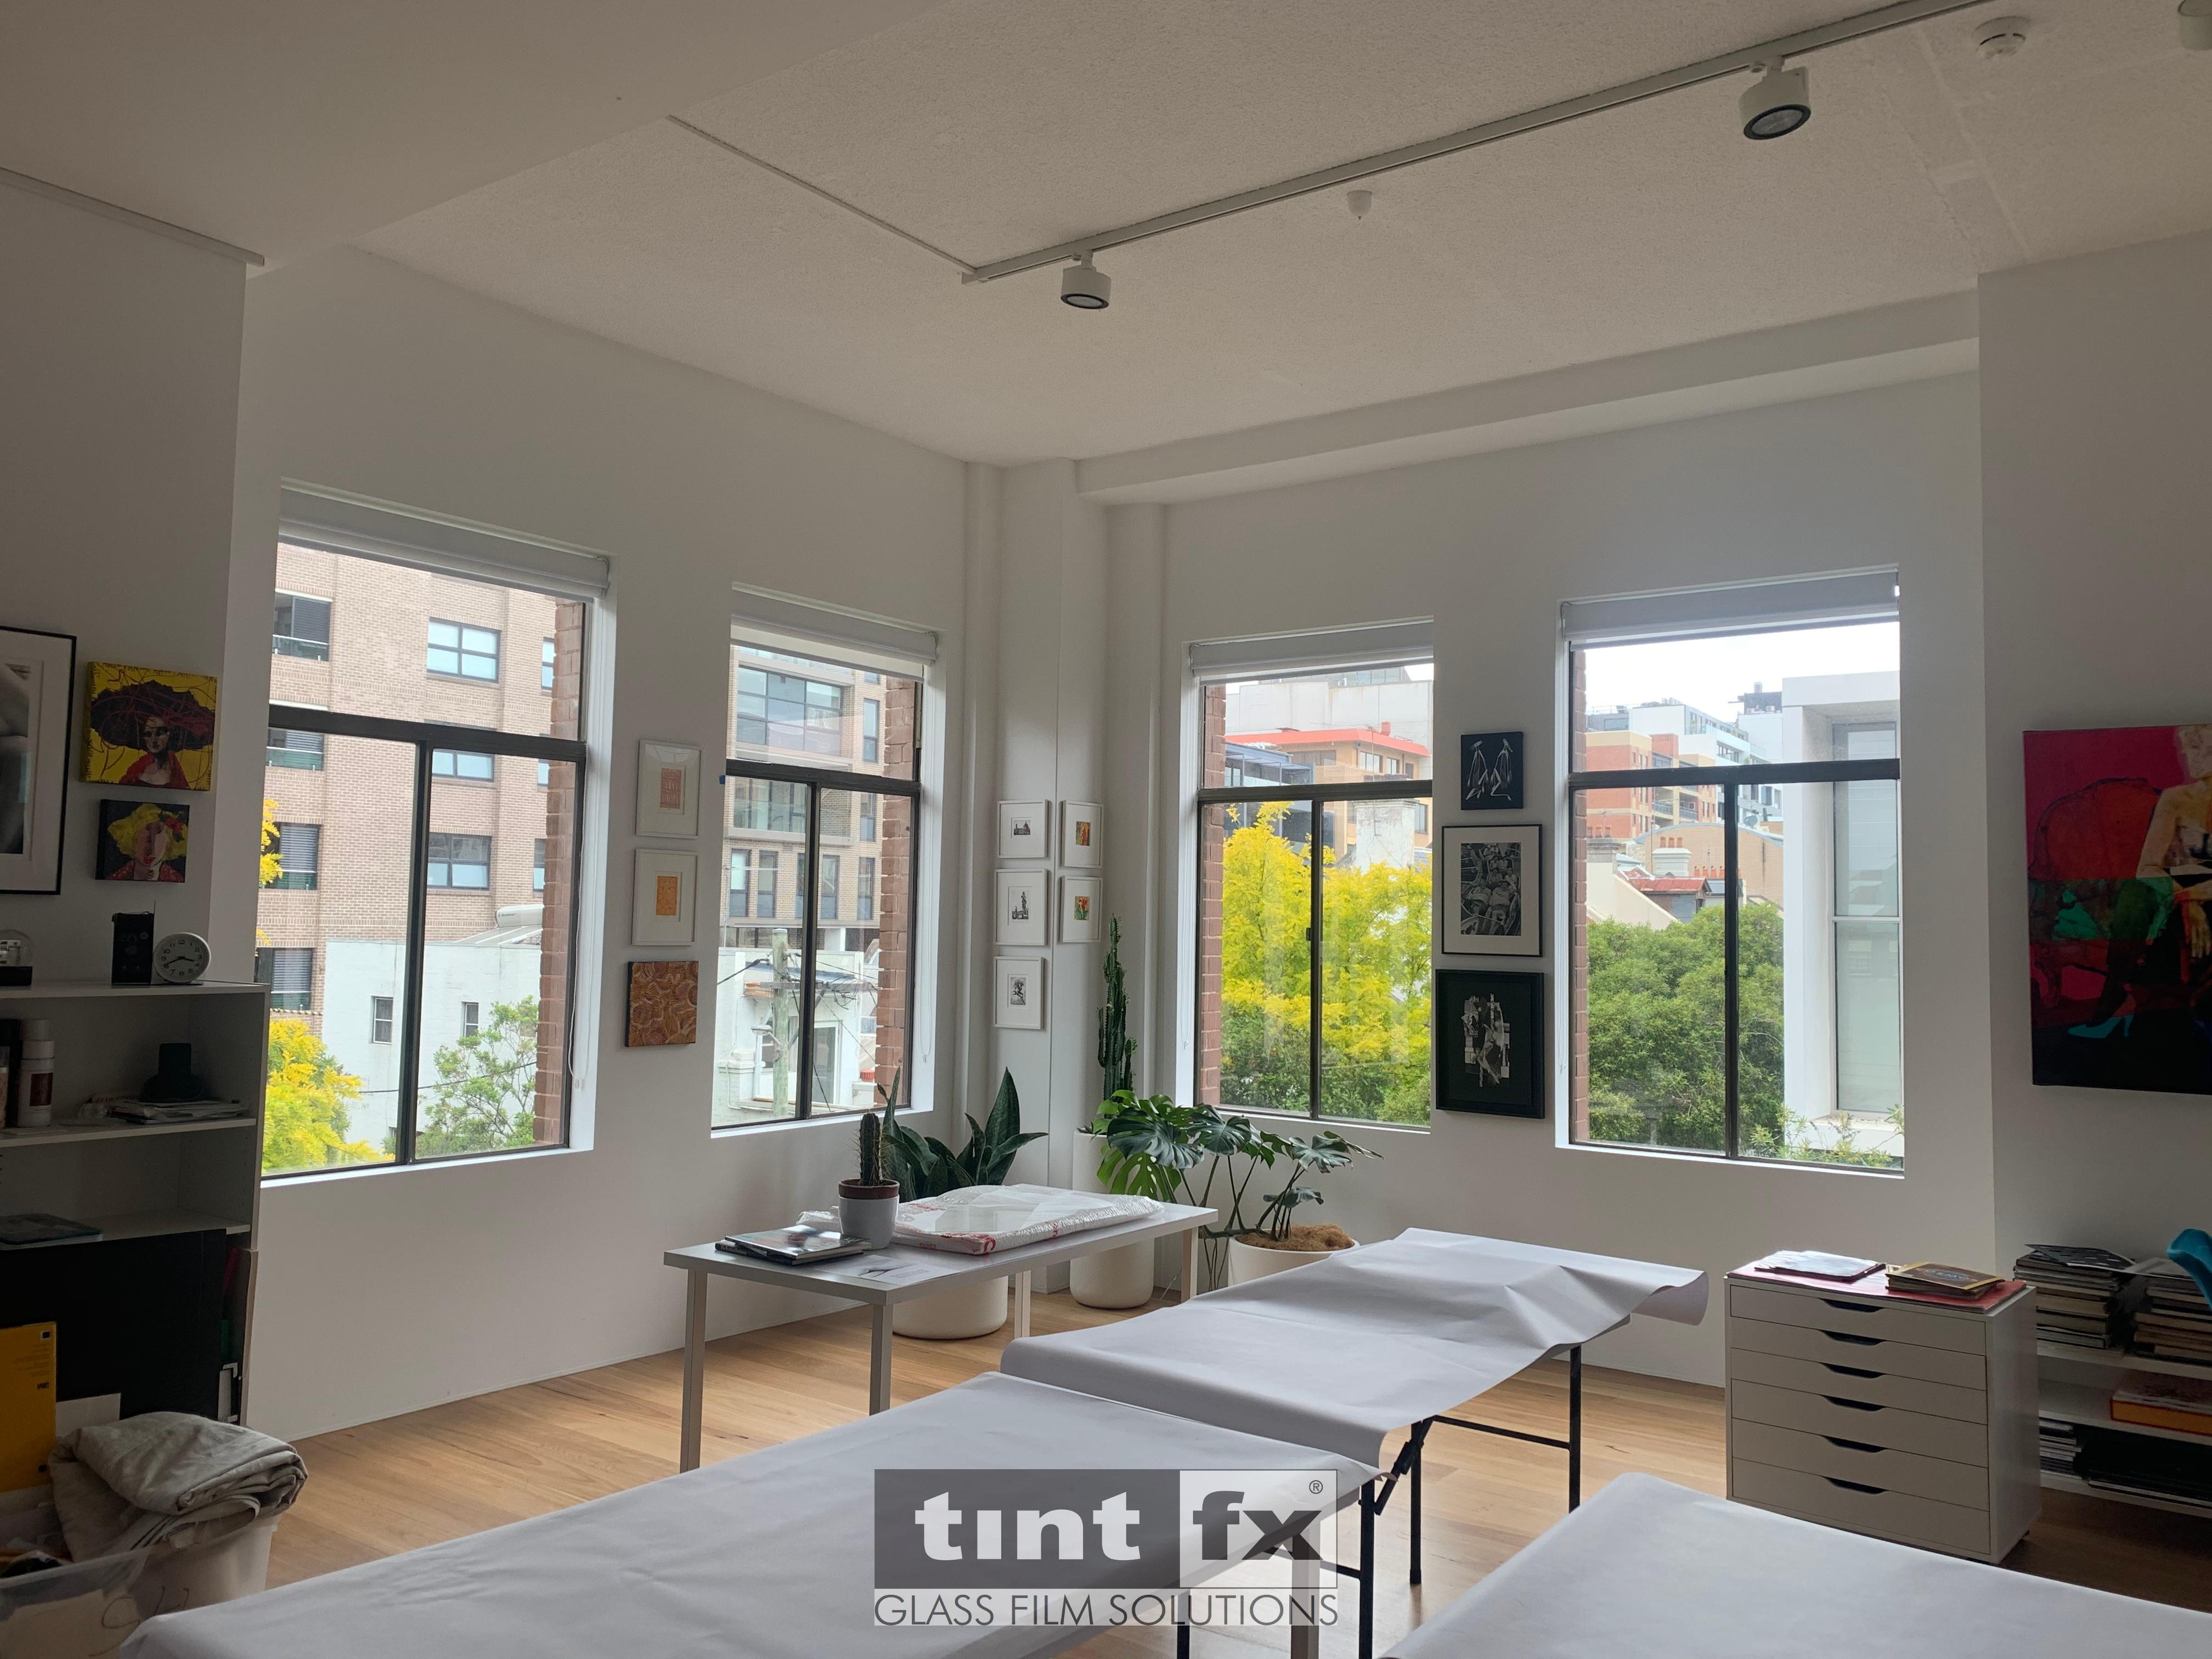 3M Thinsulate 75 C Surry Hills 1/2 floor 80 windows internal image 02